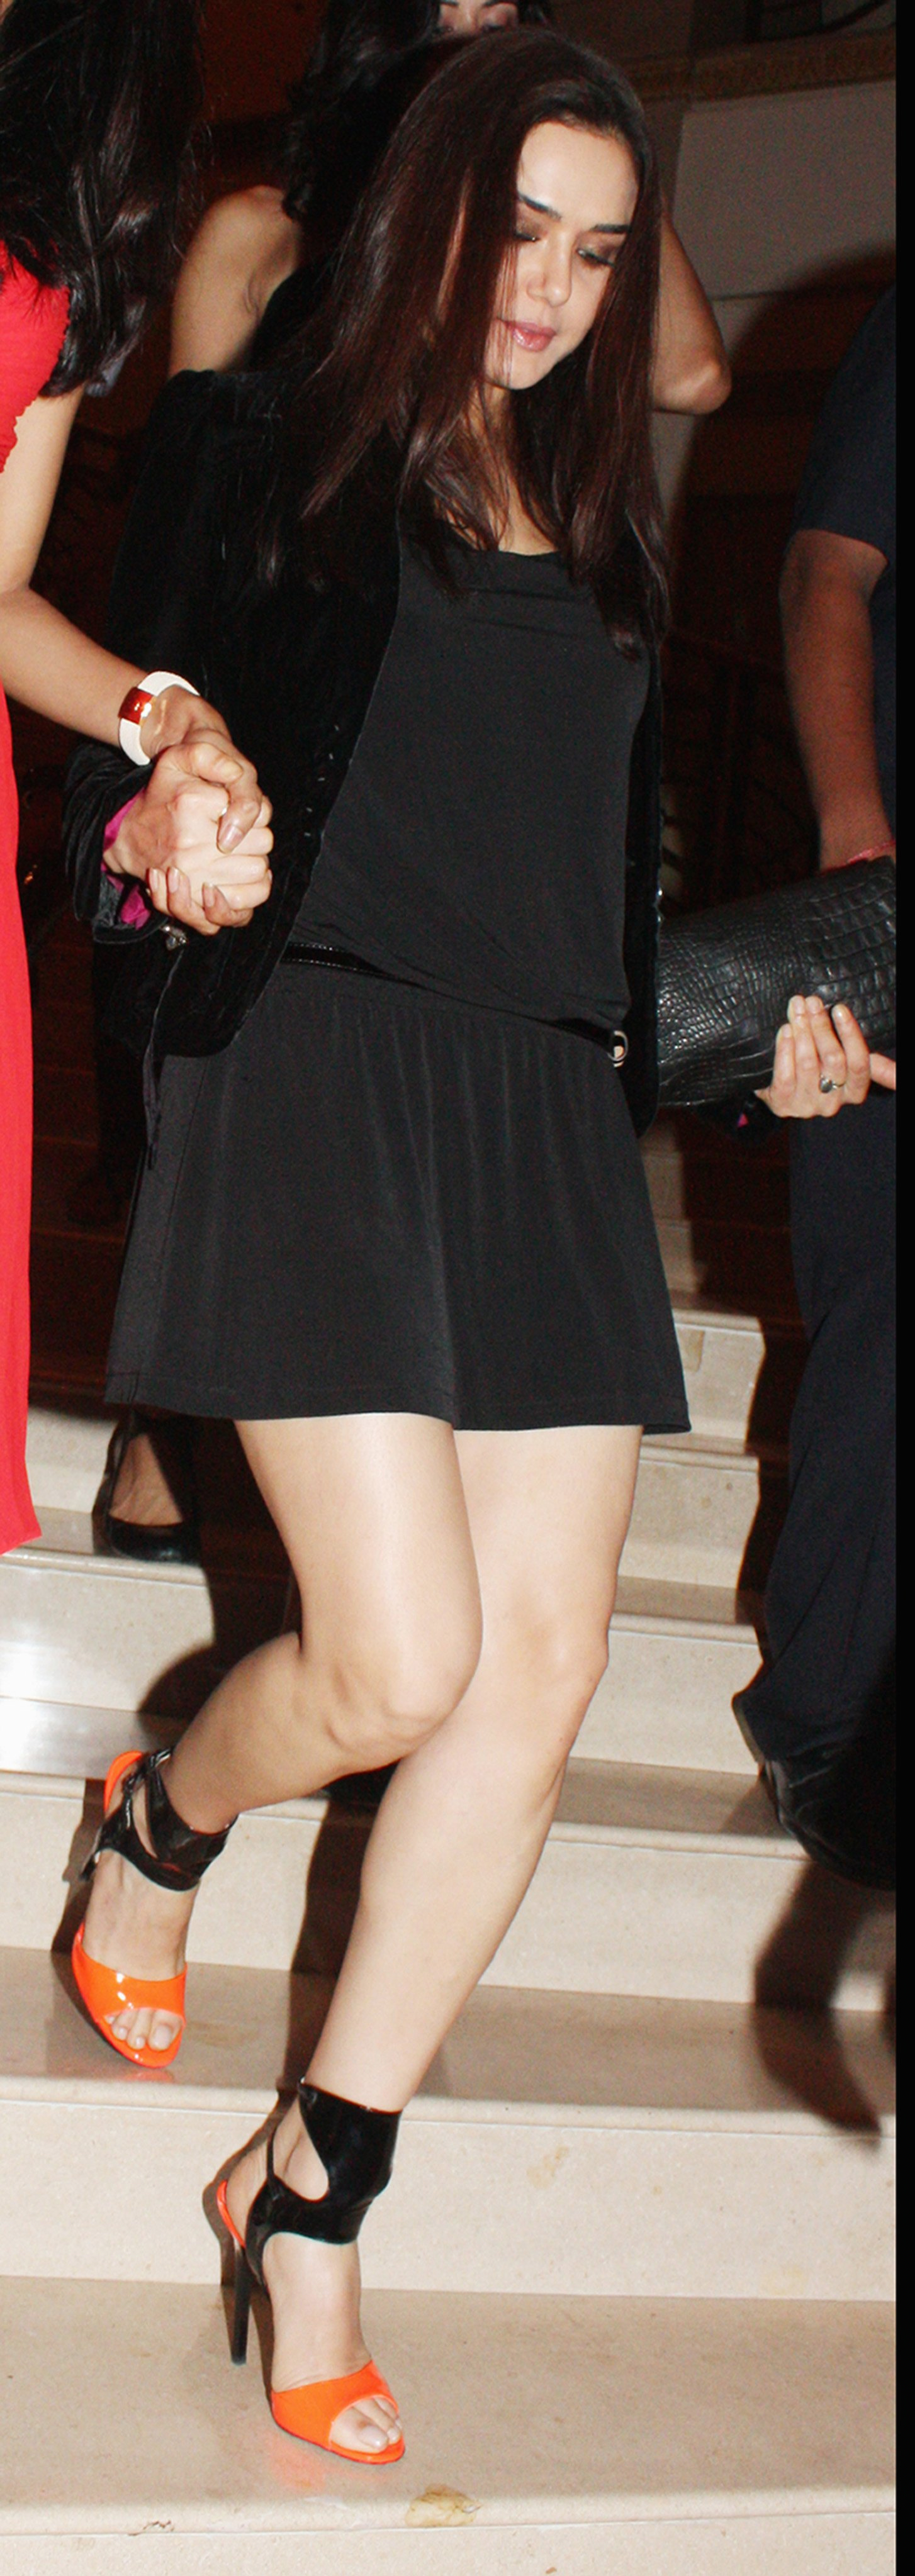 https://i2.wp.com/pics.wikifeet.com/Preity-Zinta-Feet-458342.jpg